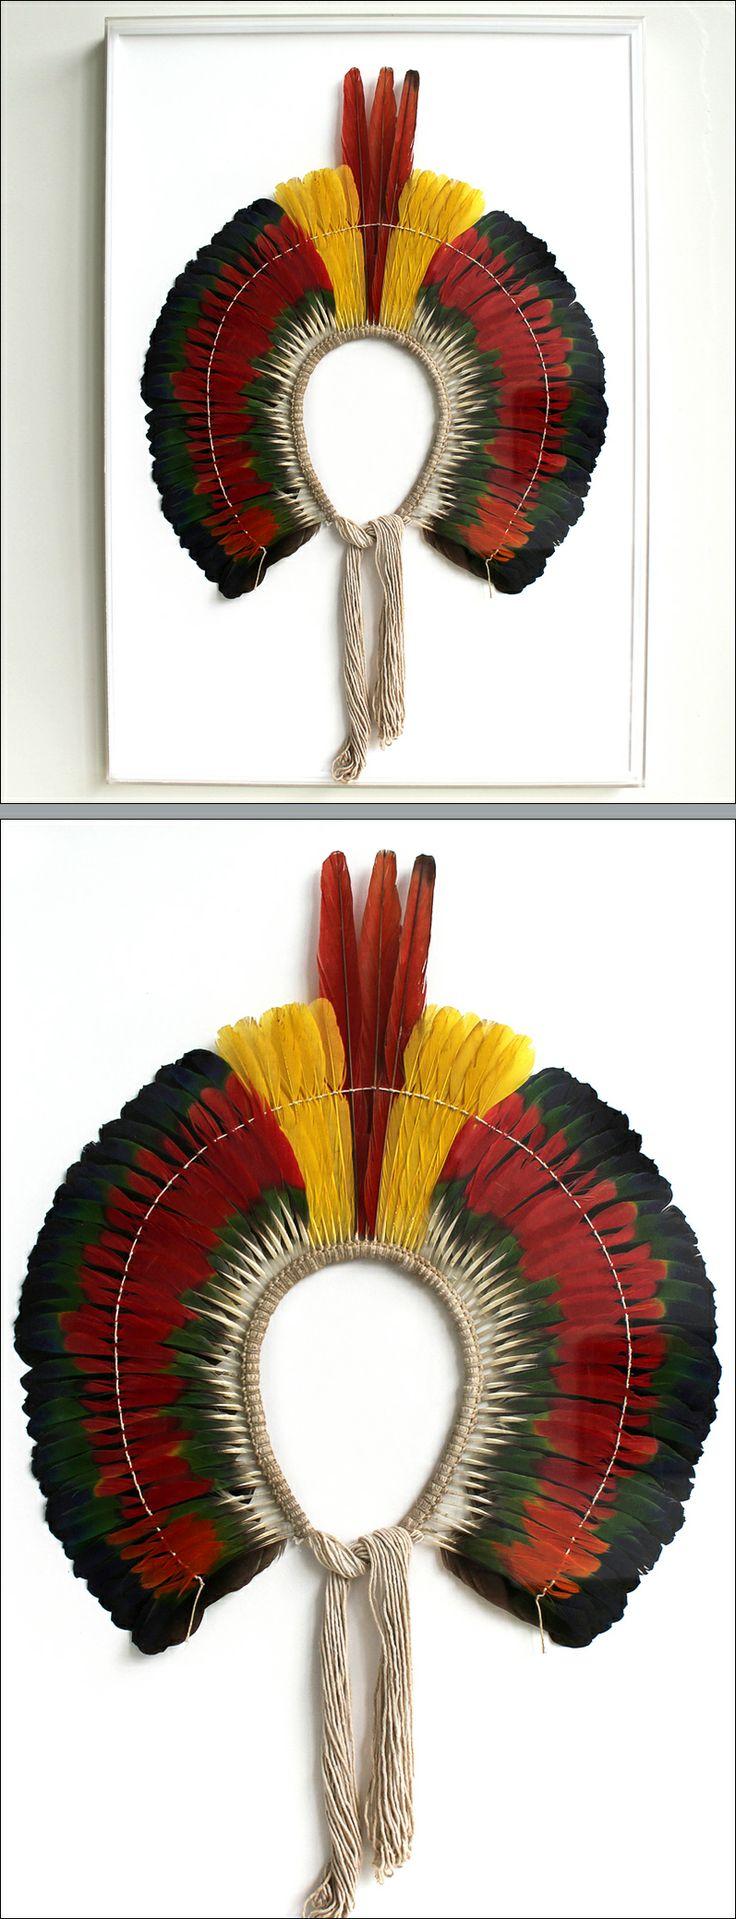 http://www.tribalartfinder.com/images/products/Kapajo%20headdress%20c.jpg